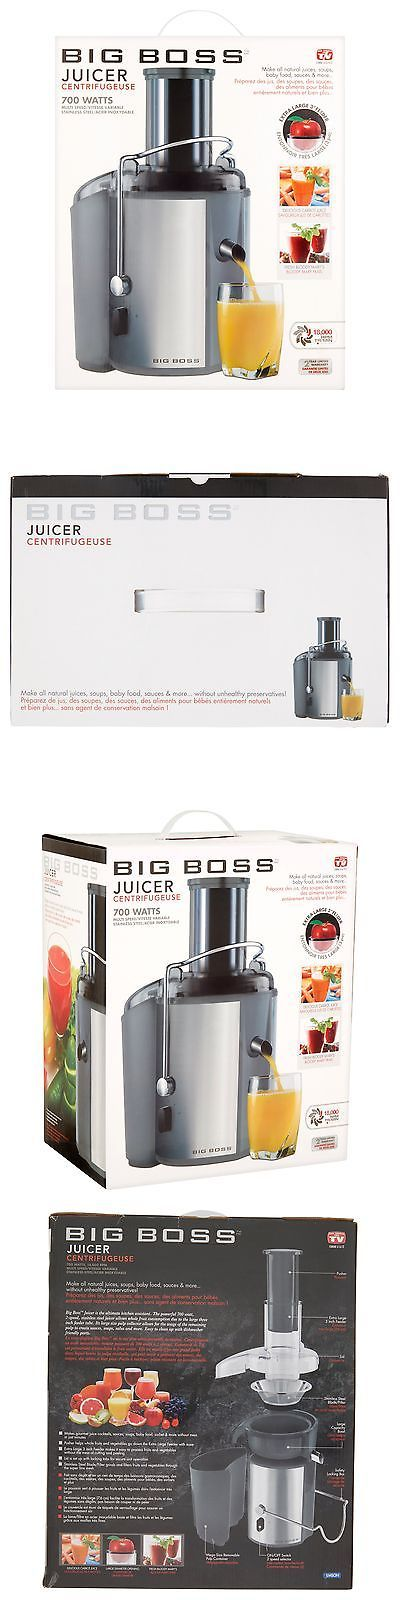 Juicers 20677: Juice Extractor Fruit Vegetable Juicer Healthy Citrus Green Juicing Drink Maker -> BUY IT NOW ONLY: $73.88 on eBay!